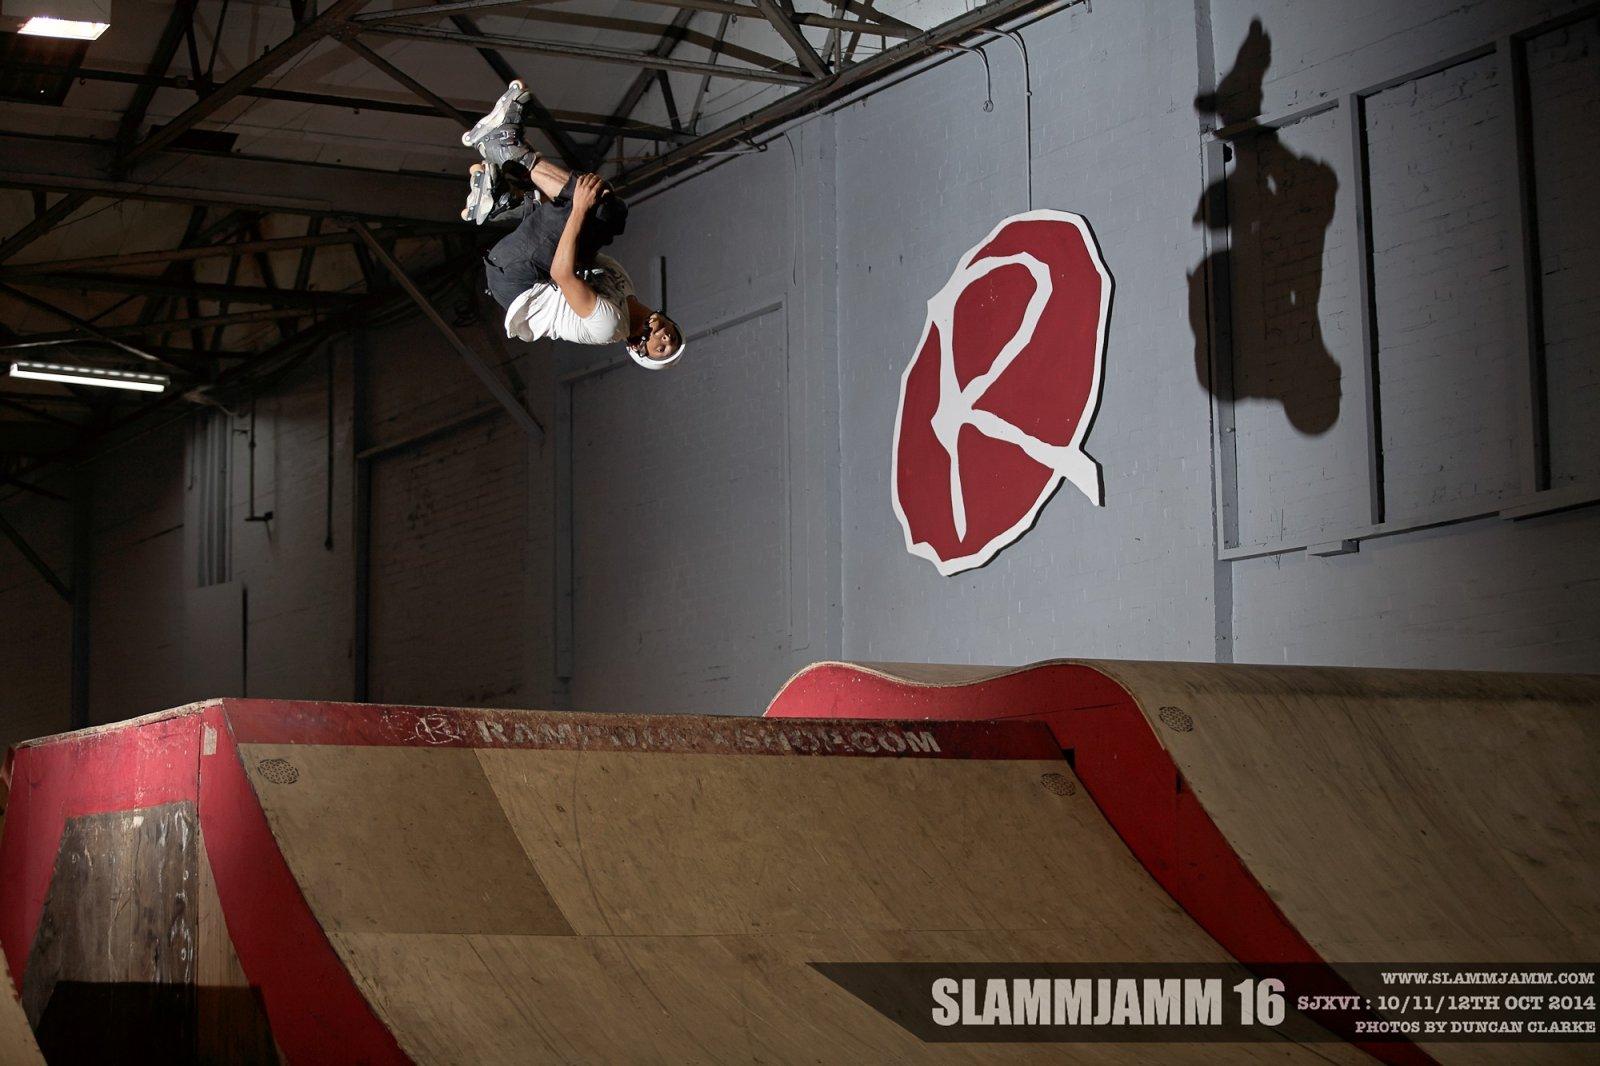 Slamm Jamm 16 photos